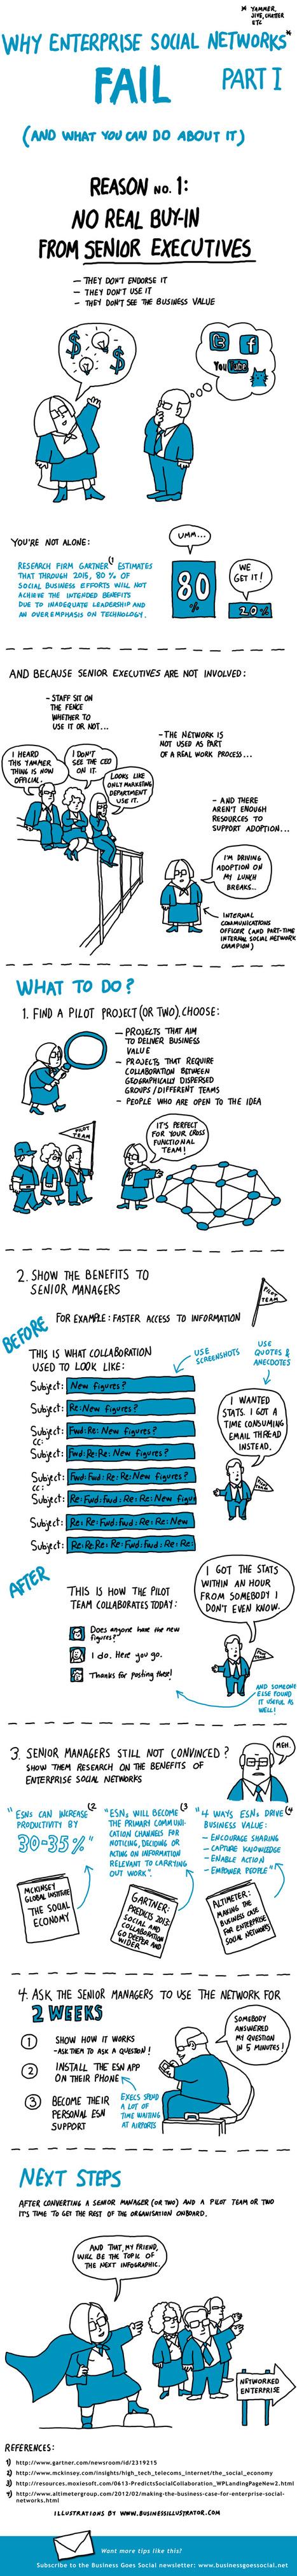 Why Enterprise Social Networks Fail | Social Media | Scoop.it